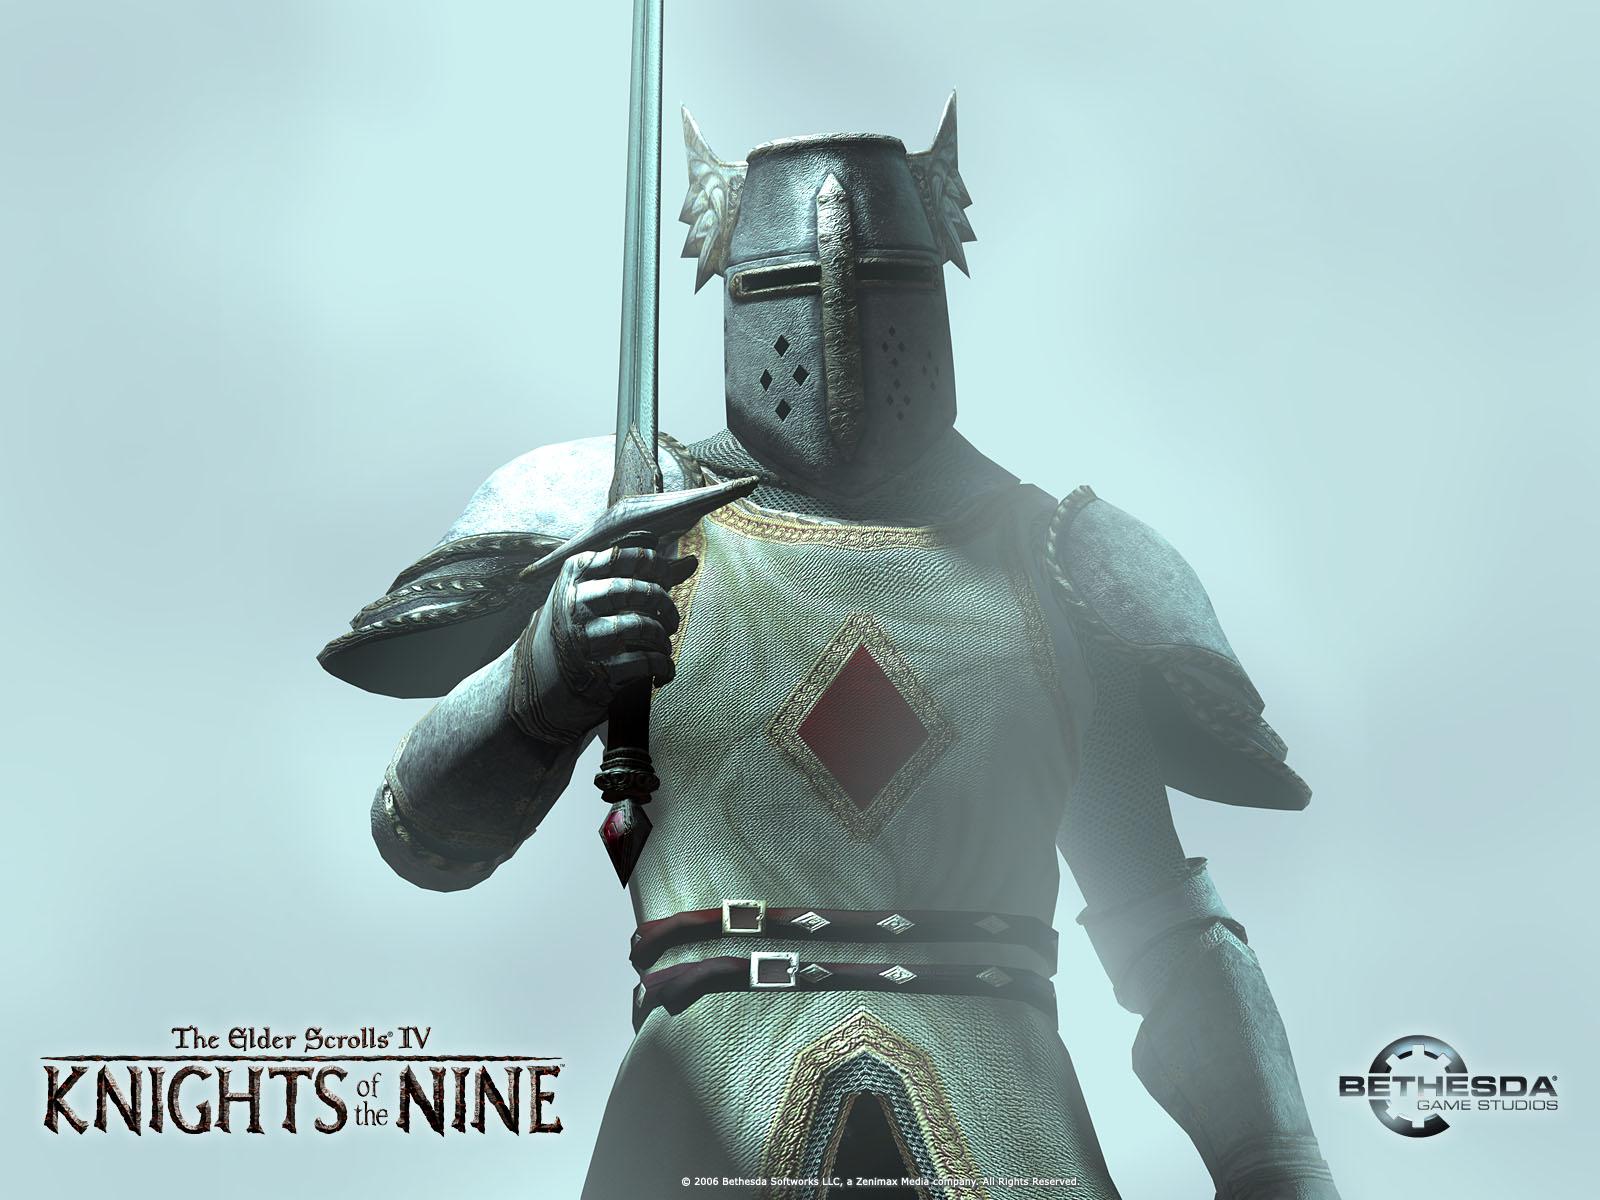 The Elder Scrolls IV: Oblivion clipart #1, Download drawings